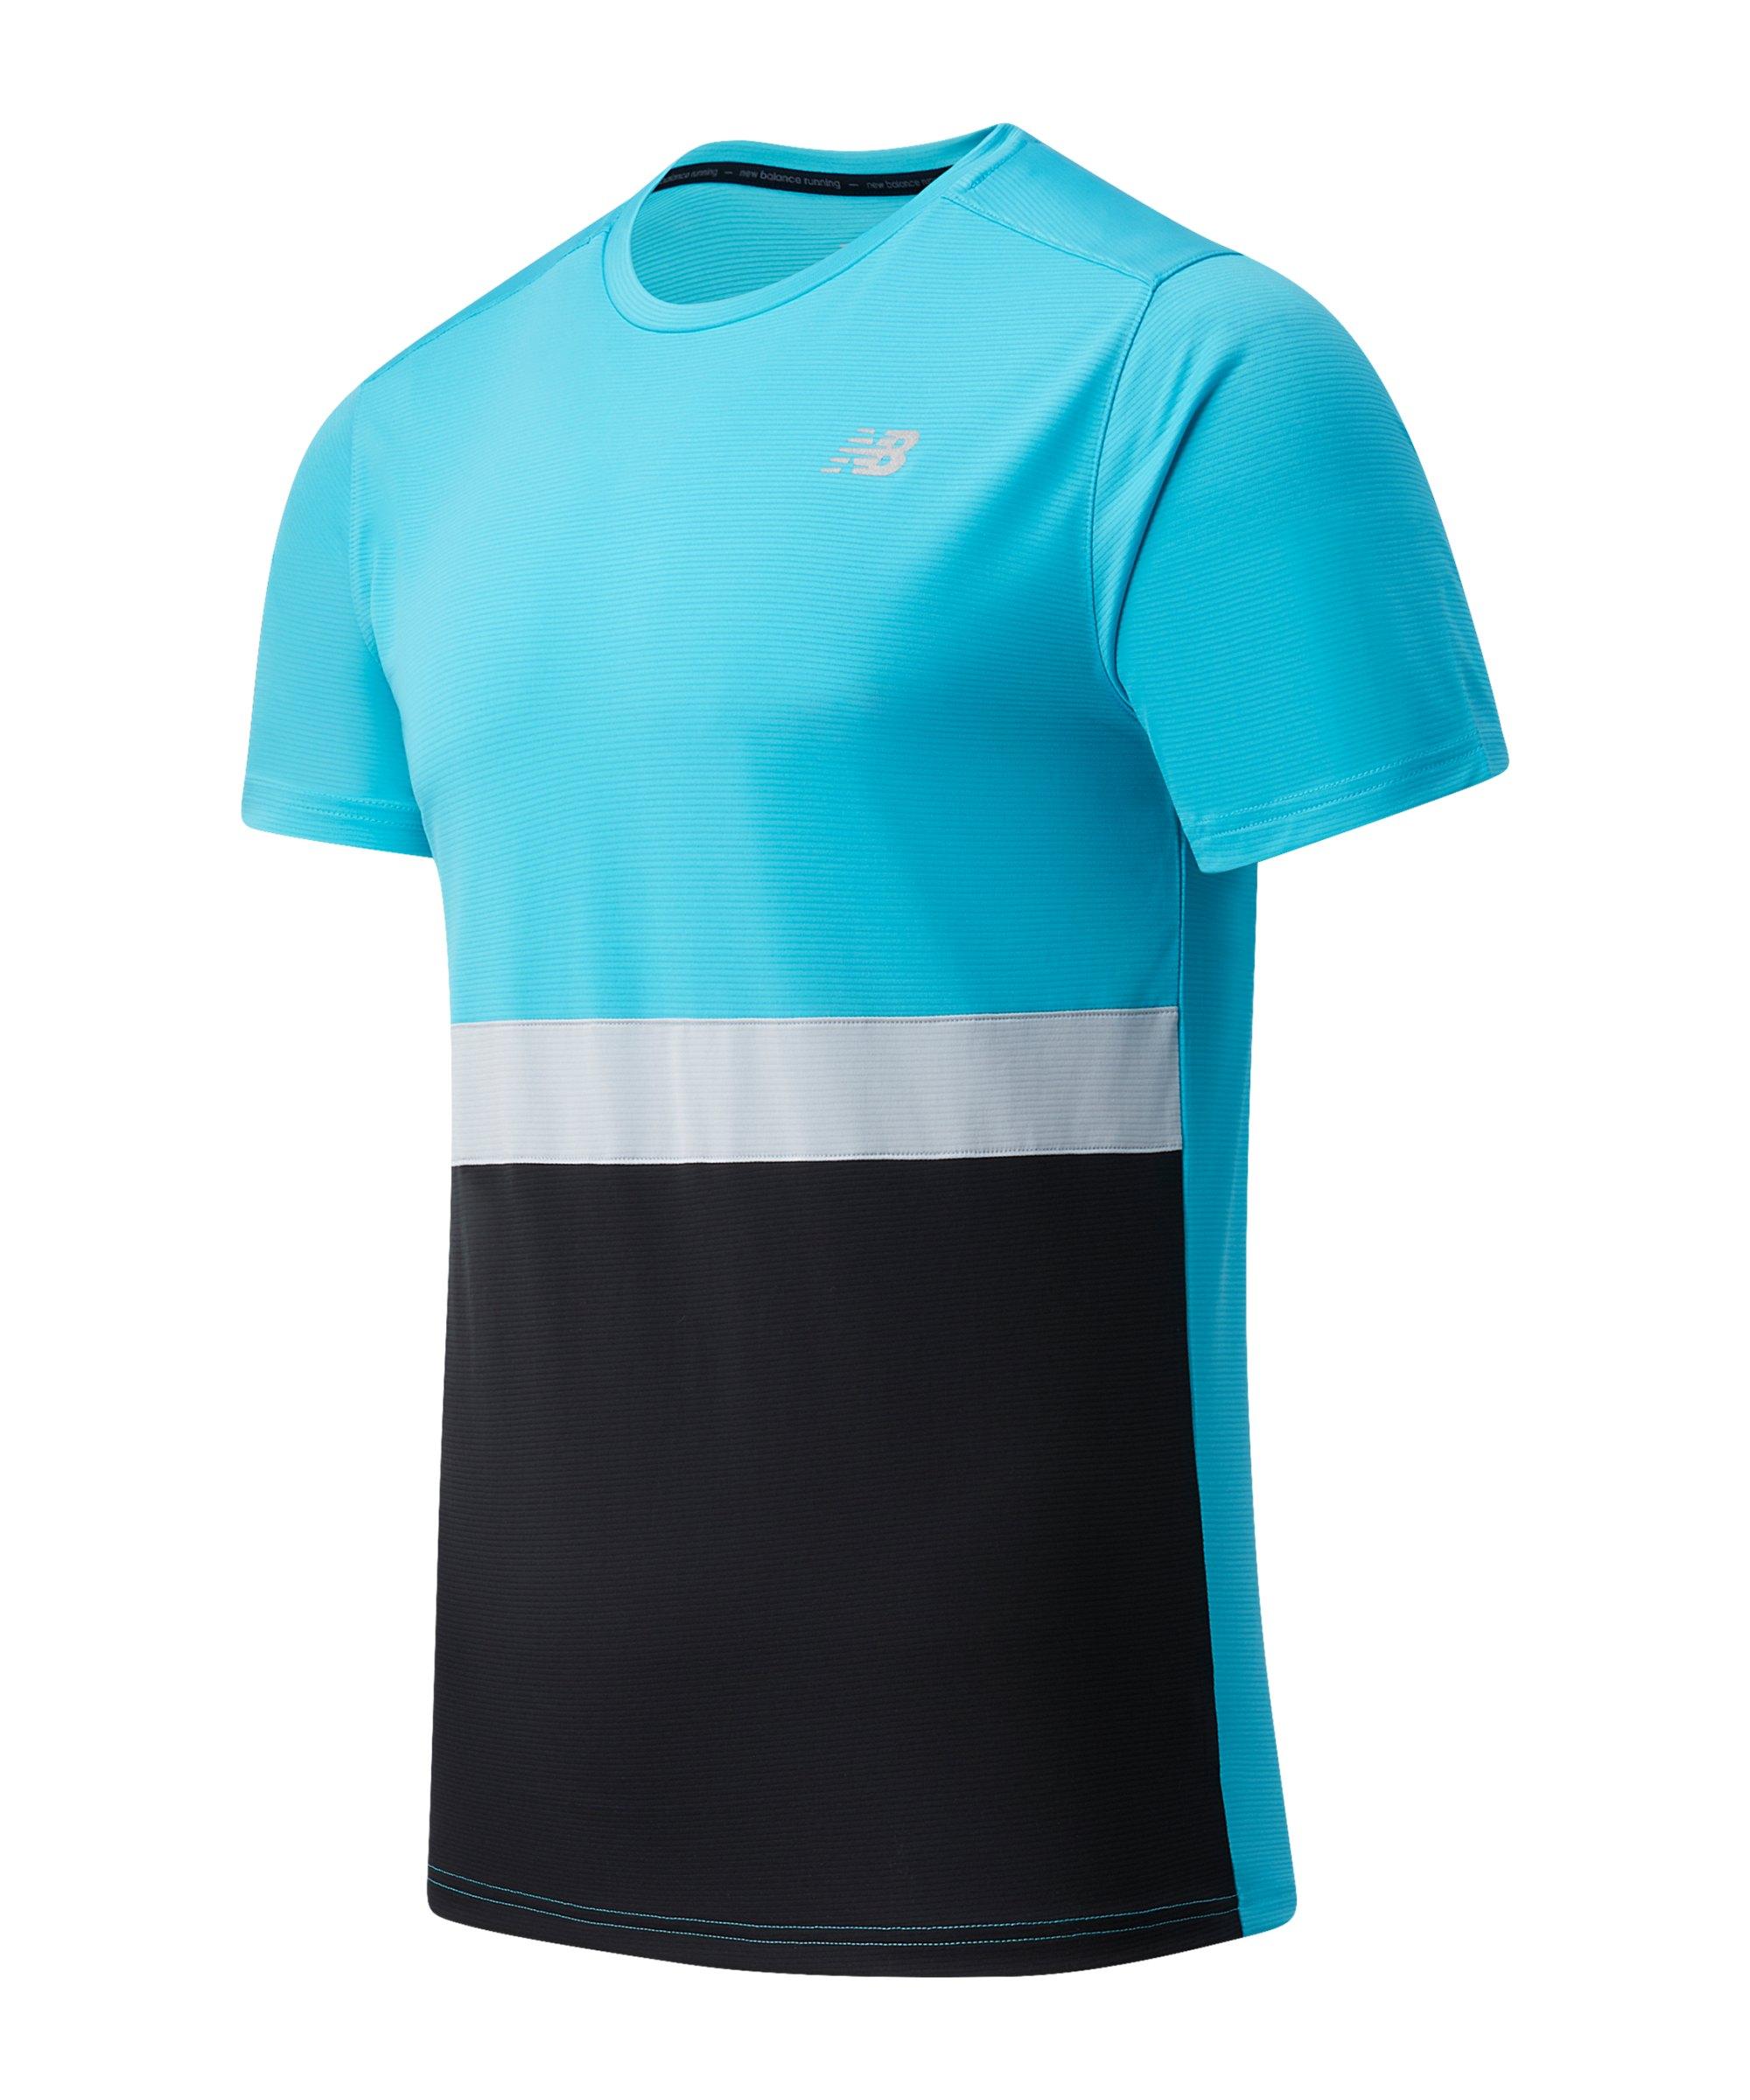 New Balance Striped Accelerate T-Shirt Blau FVLS - blau